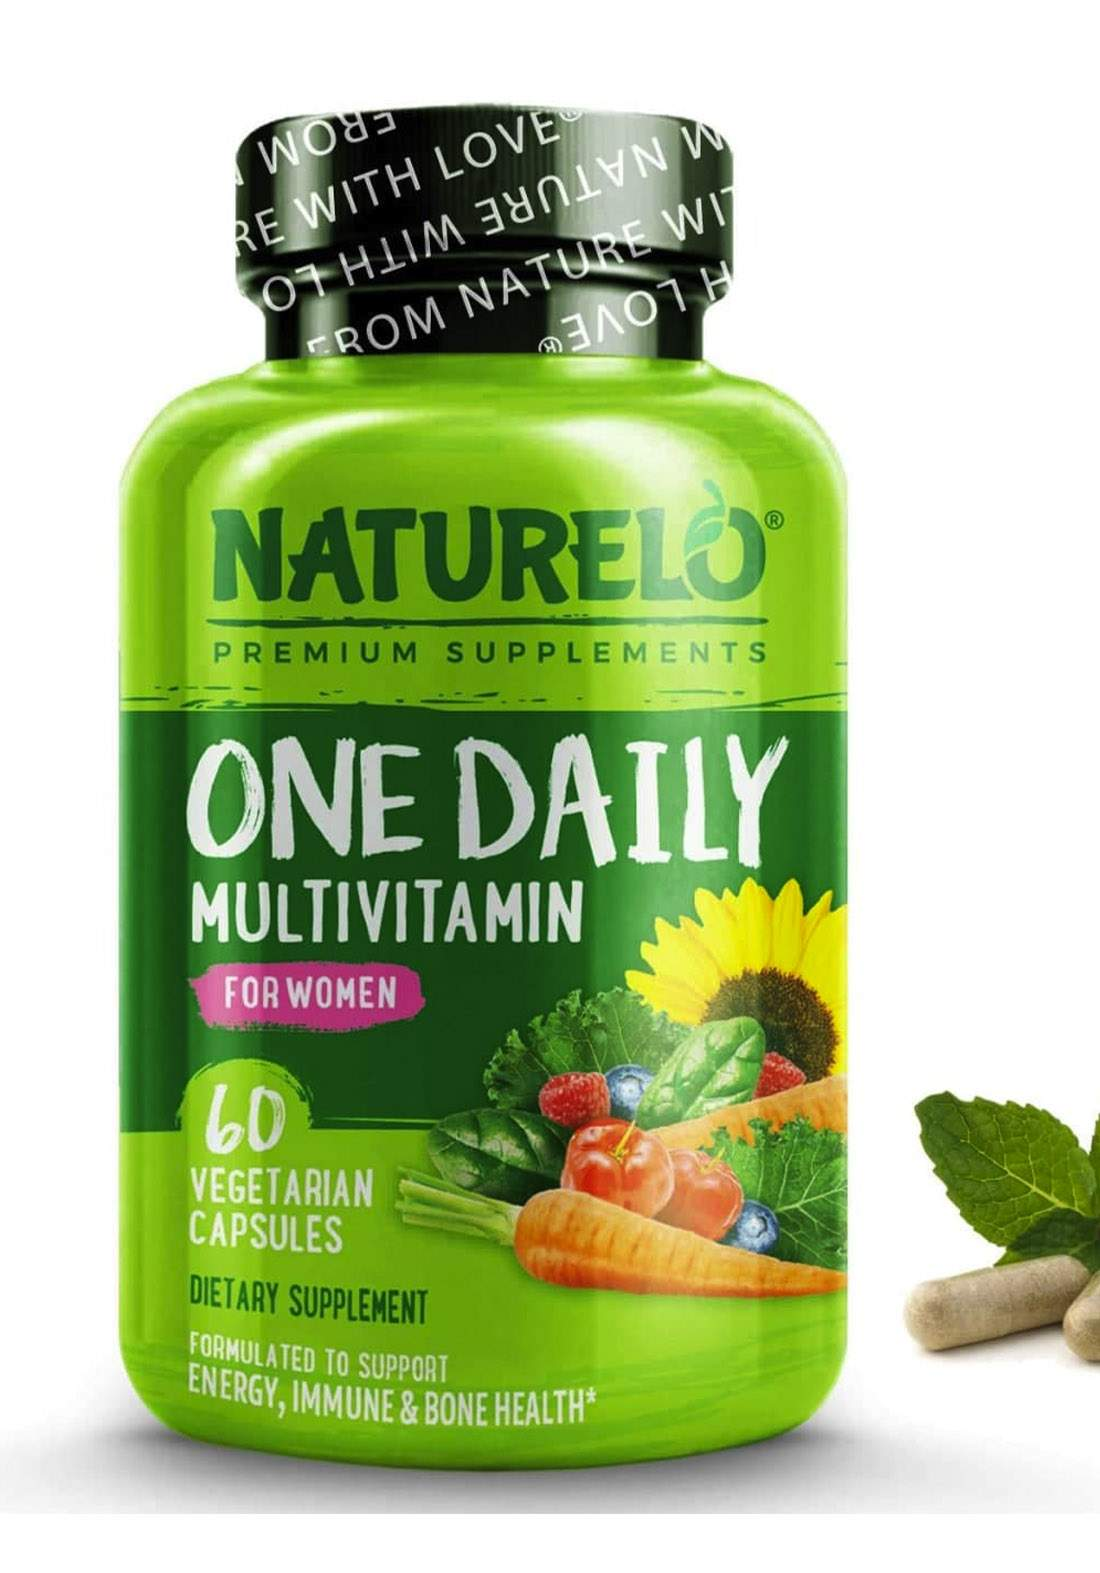 Naturelo  Multivitamin For Women 60 Capsules Vegetarian فيتامينات